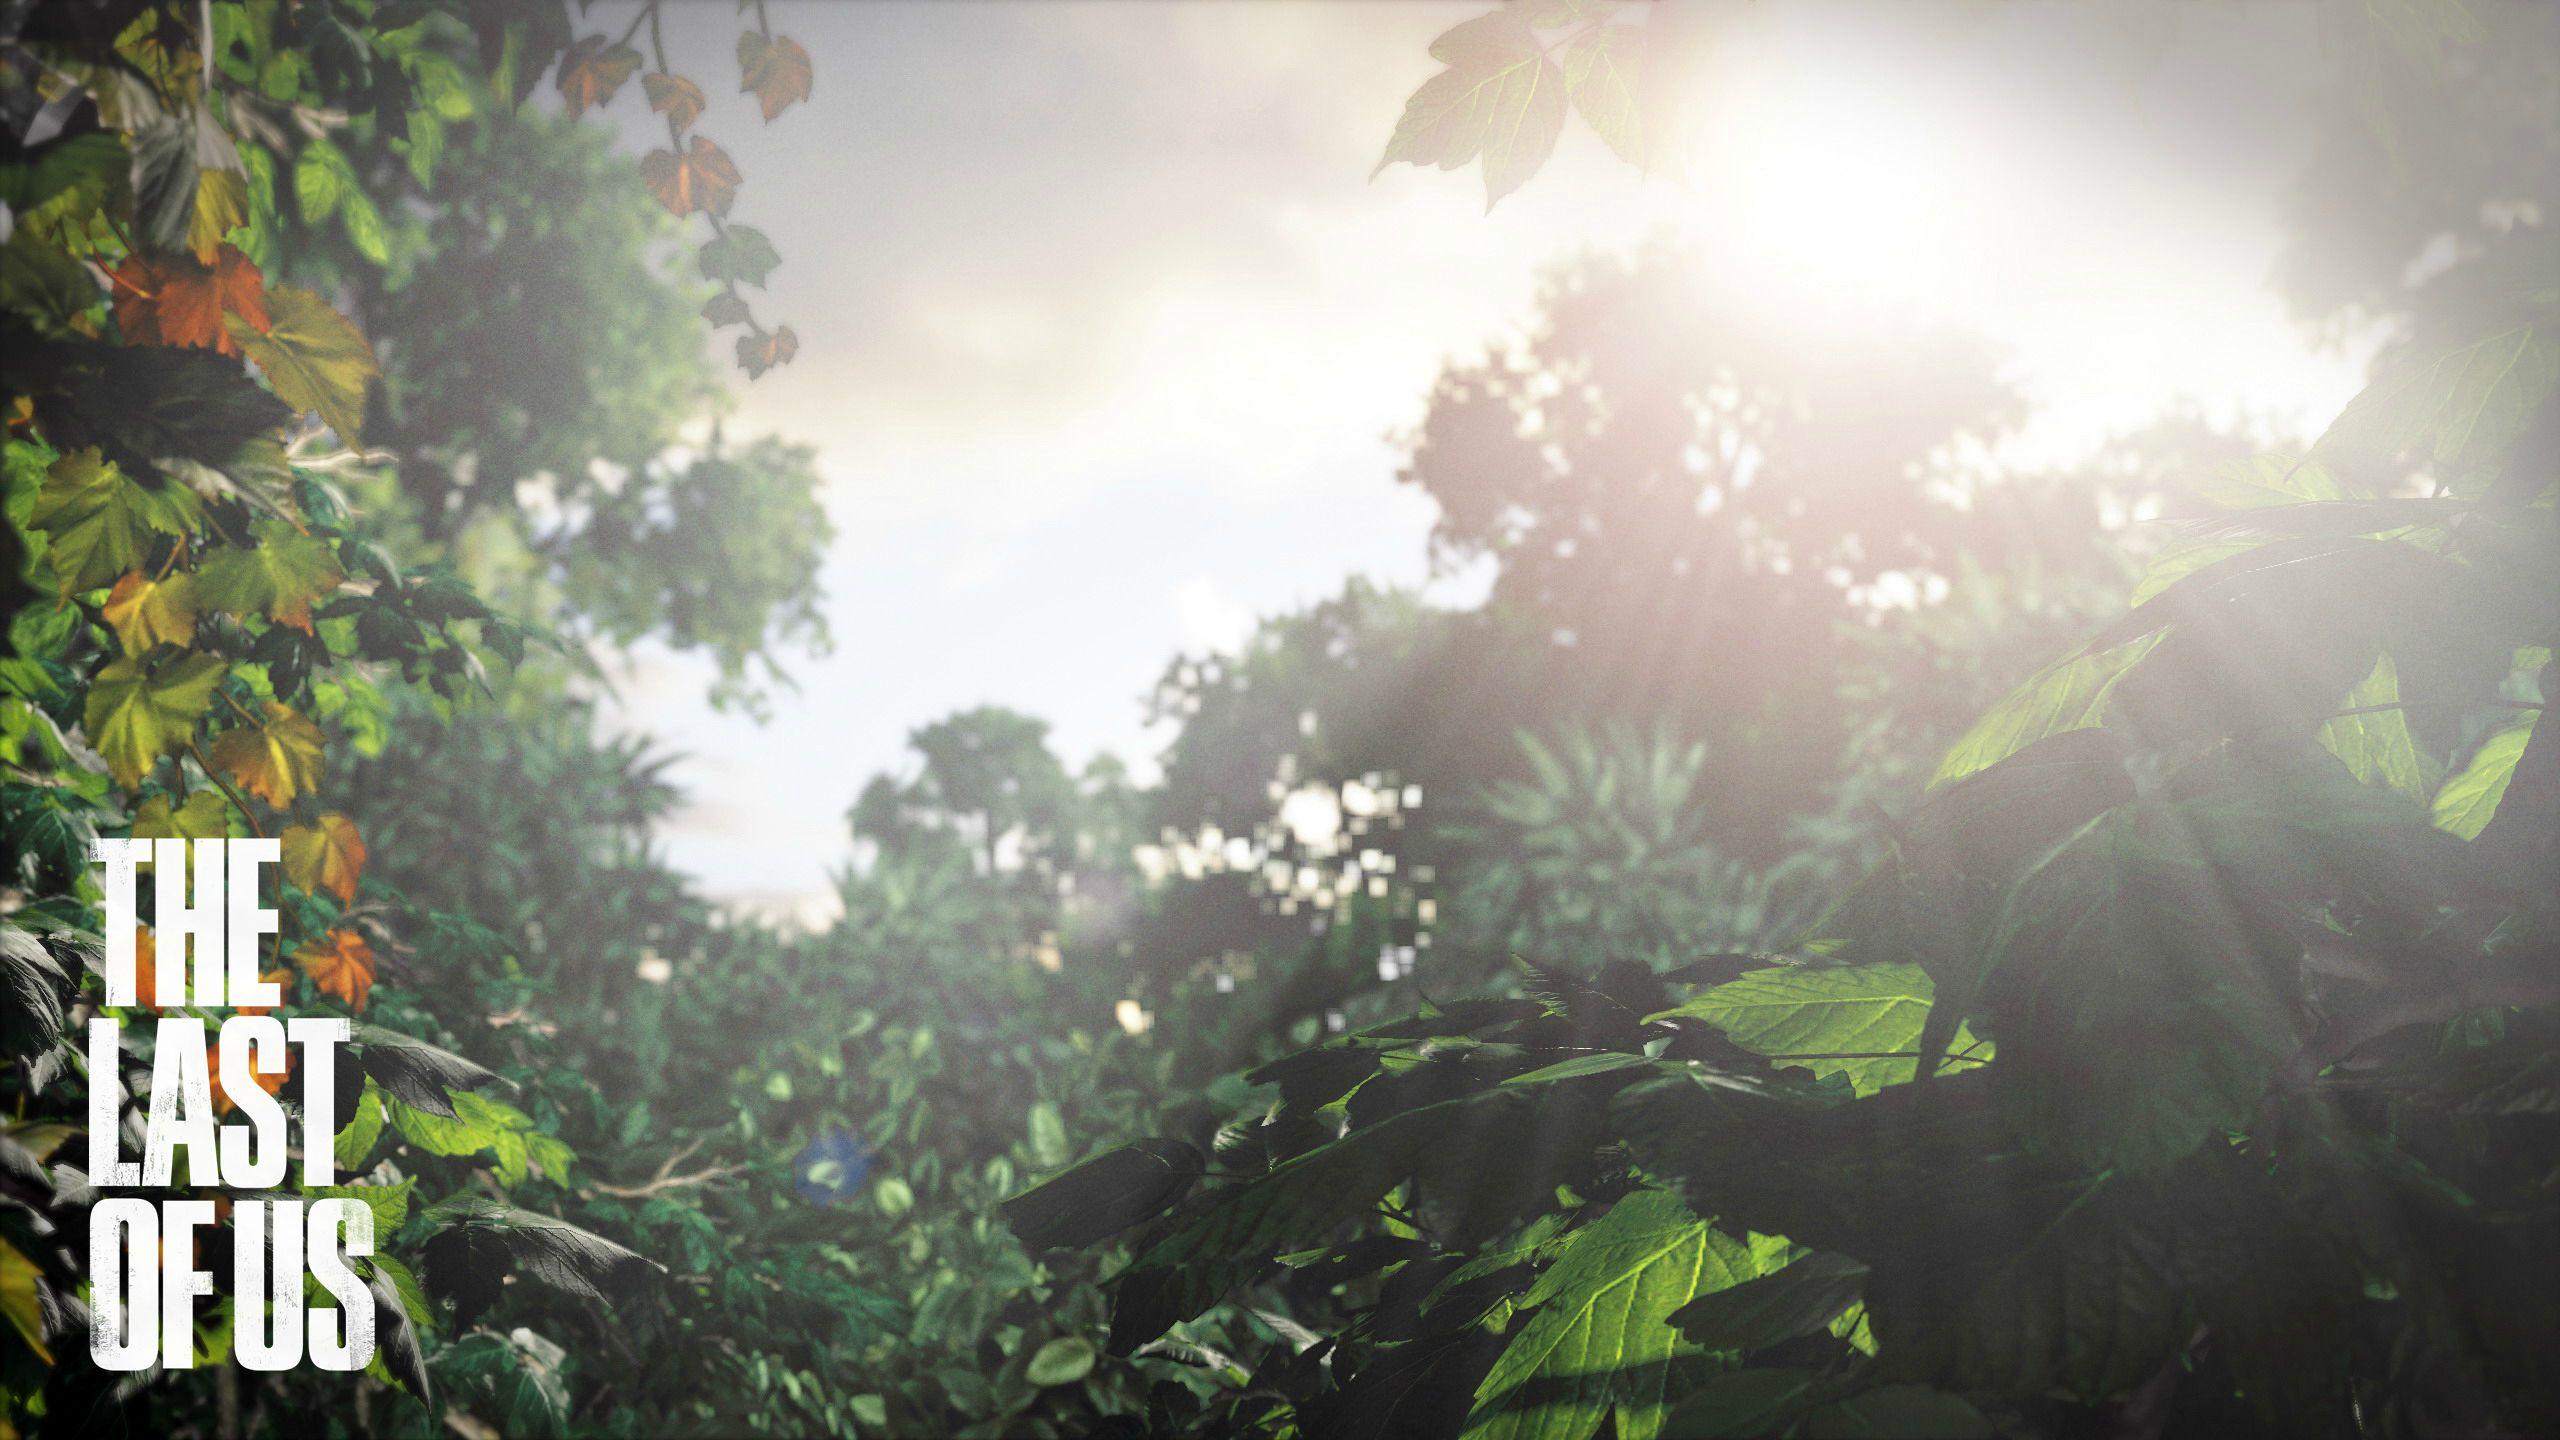 Tvůrci Uncharted chystají akci The Last of Us 56982